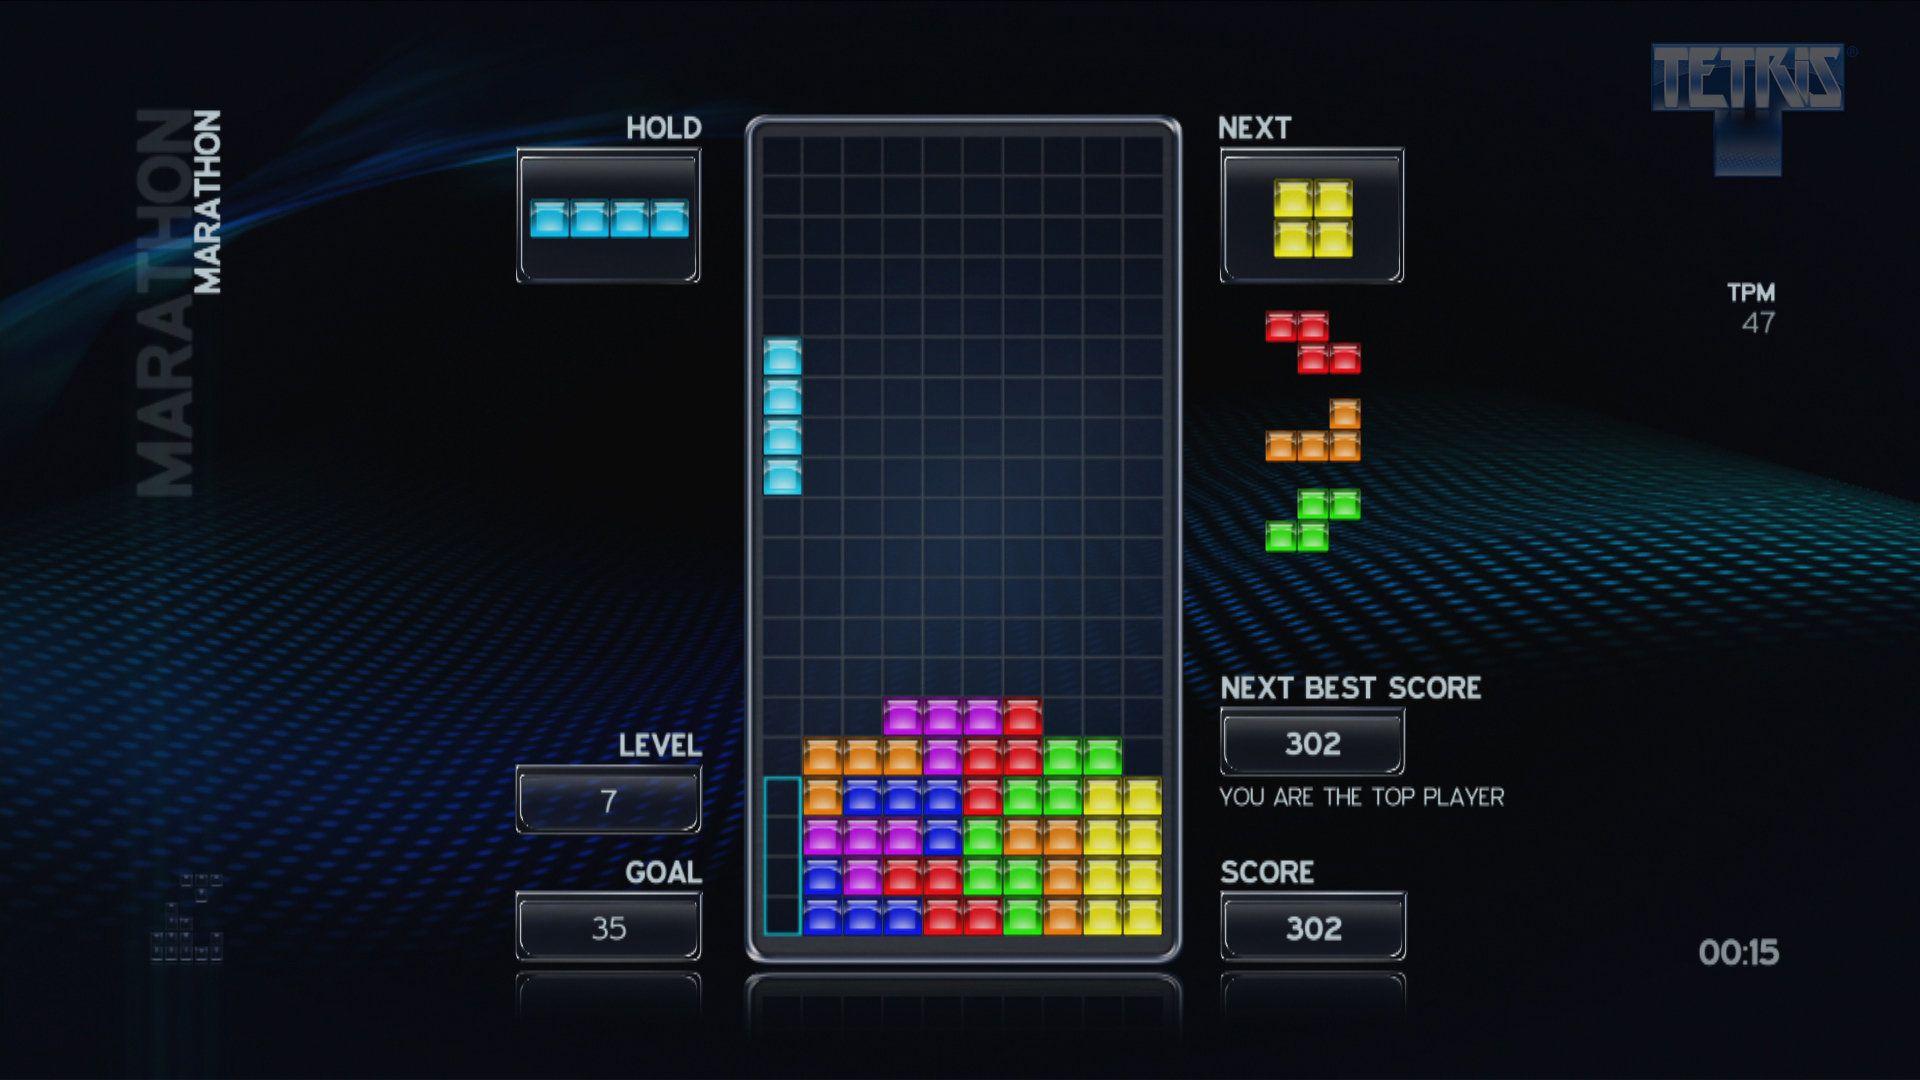 Tetris Online Play Free Tetris Game Online Today Play Now Http Playfreeonline32 Com Tetris Online Tetris Tetris Game Games